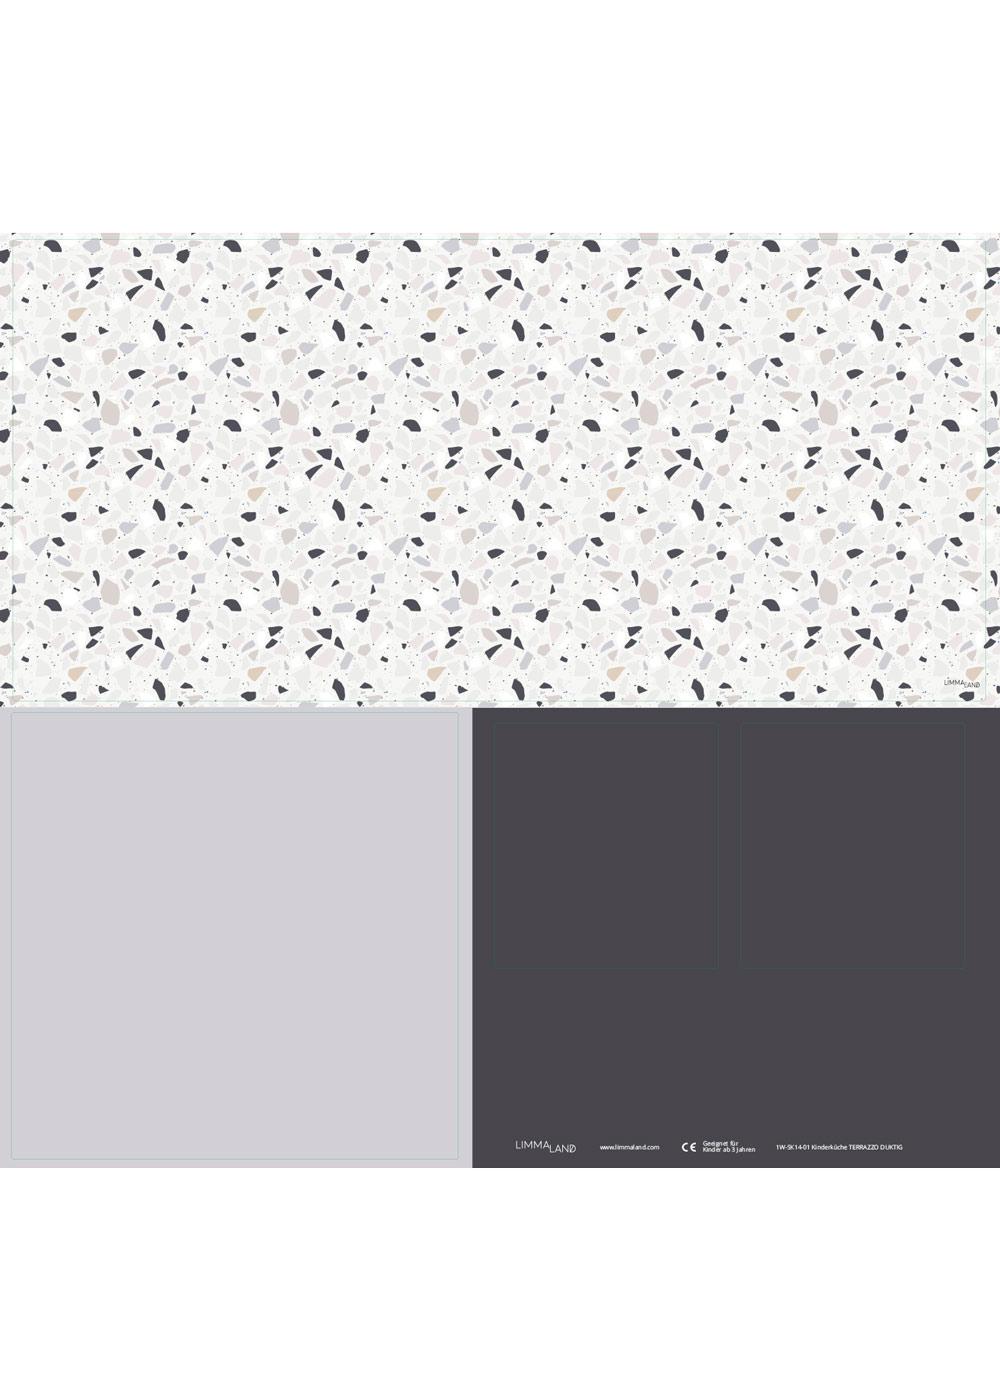 Ikea Duktig Kinderküche Terrazzo Blaugrau Druckvorlage